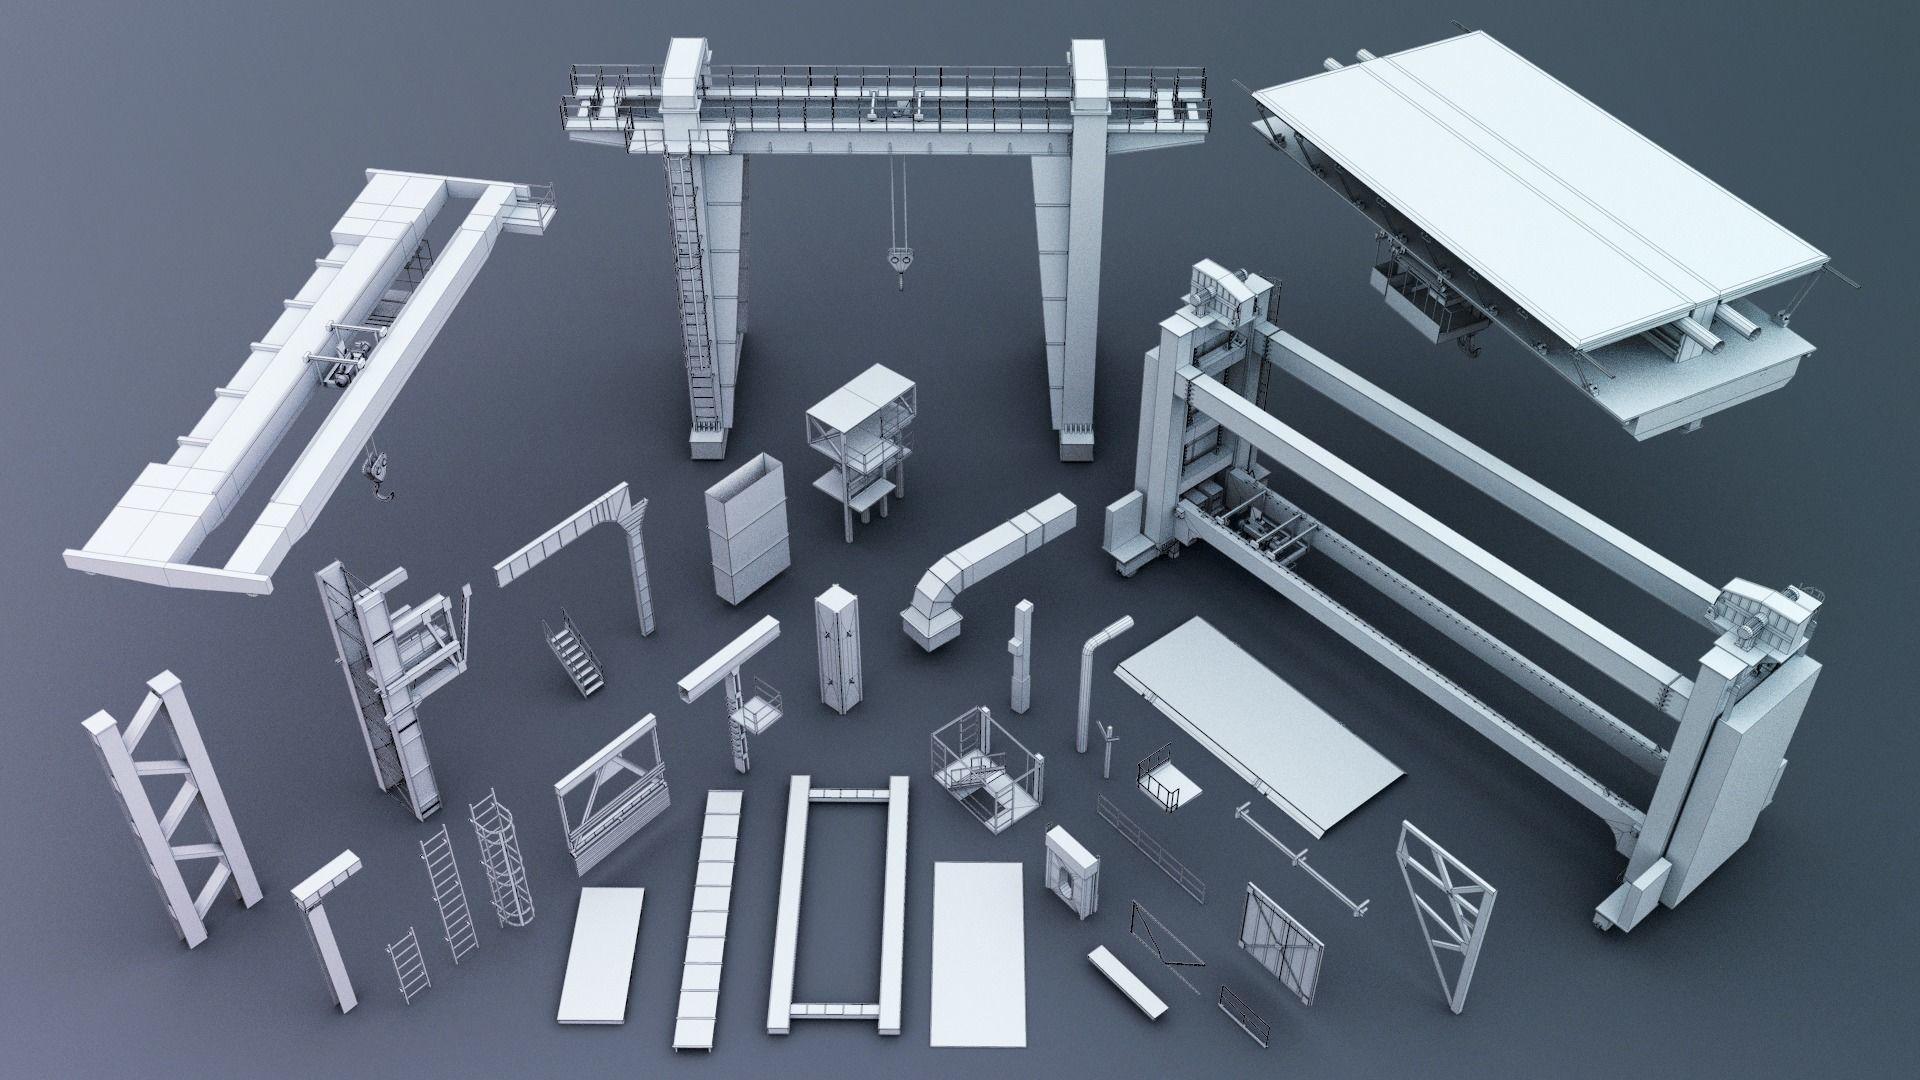 Industrial kitbash